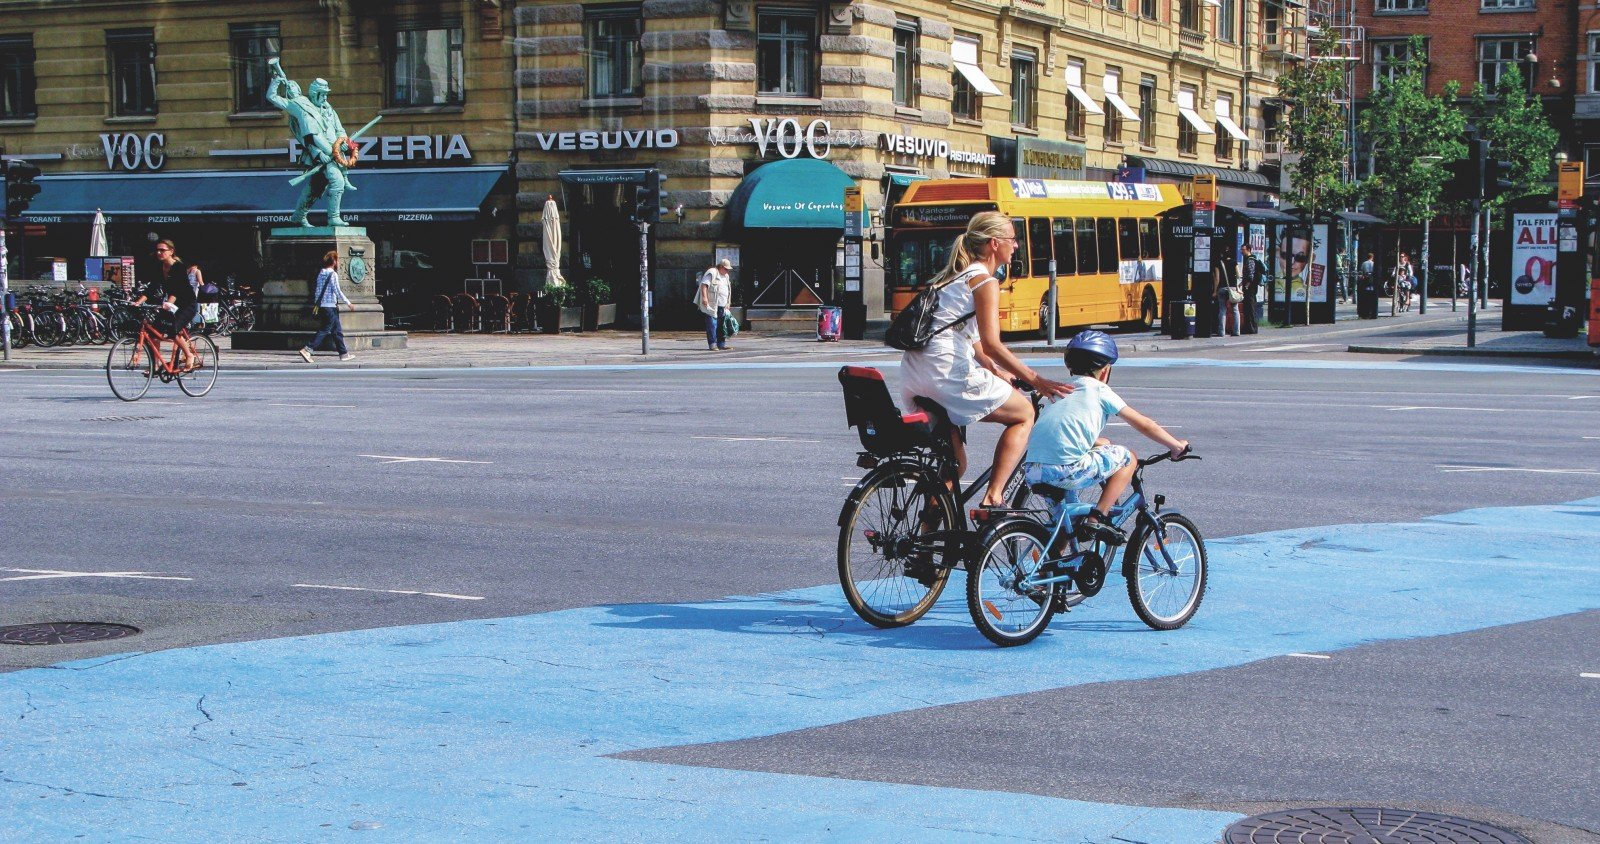 Bicycle Urbanism by Design – Next City